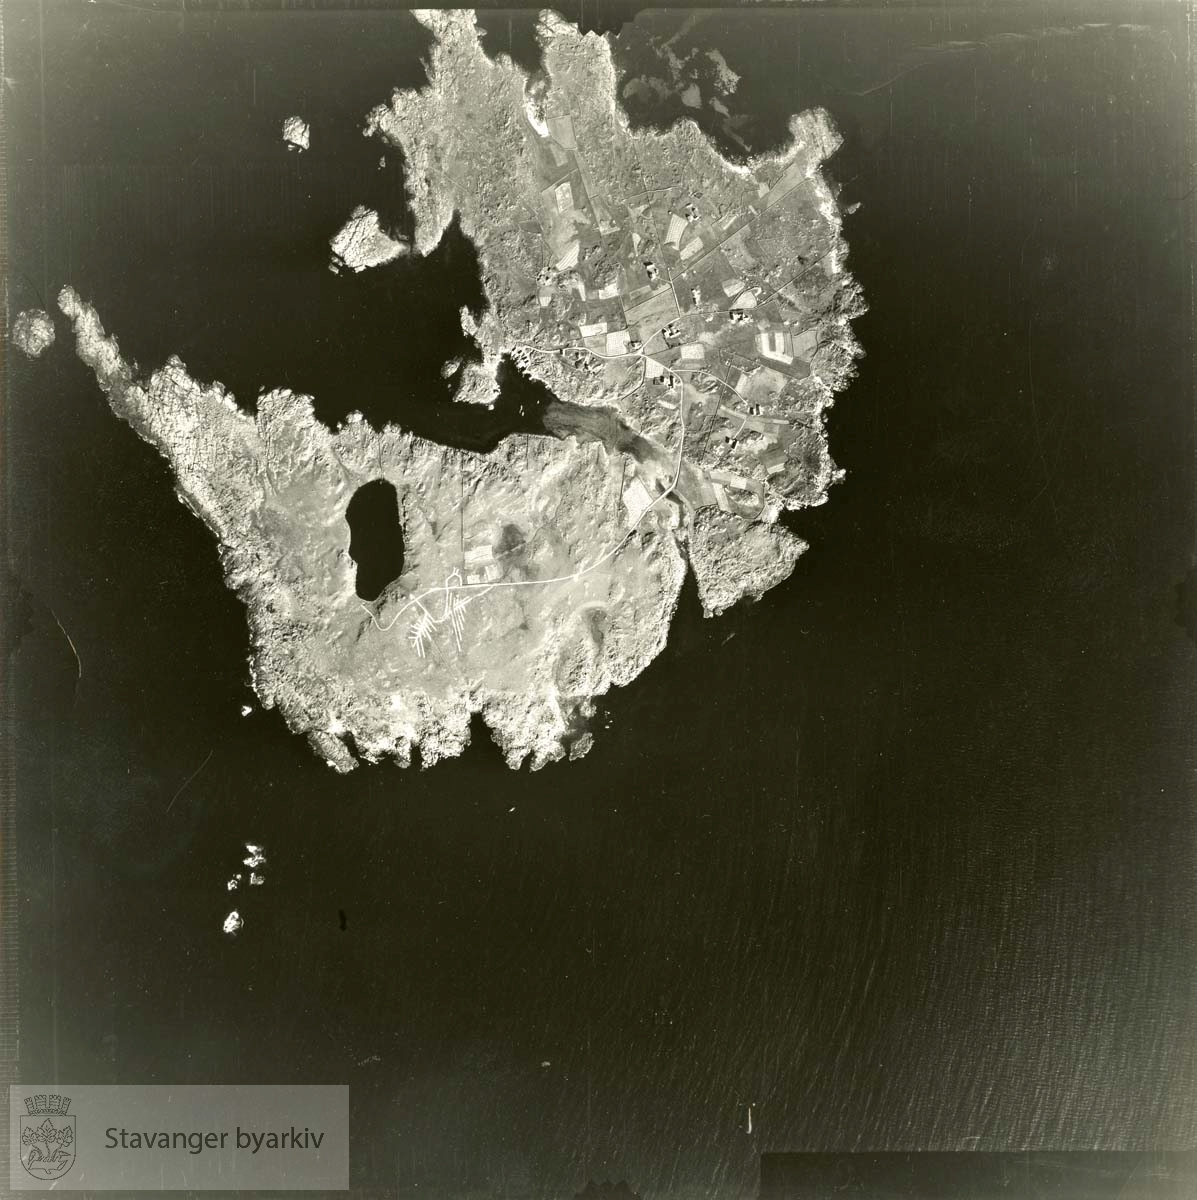 Jfr. kart/fotoplan A(I) 1/416..Se ByStW_Uca_002 (kan lastes ned under fanen for kart på Stavangerbilder)